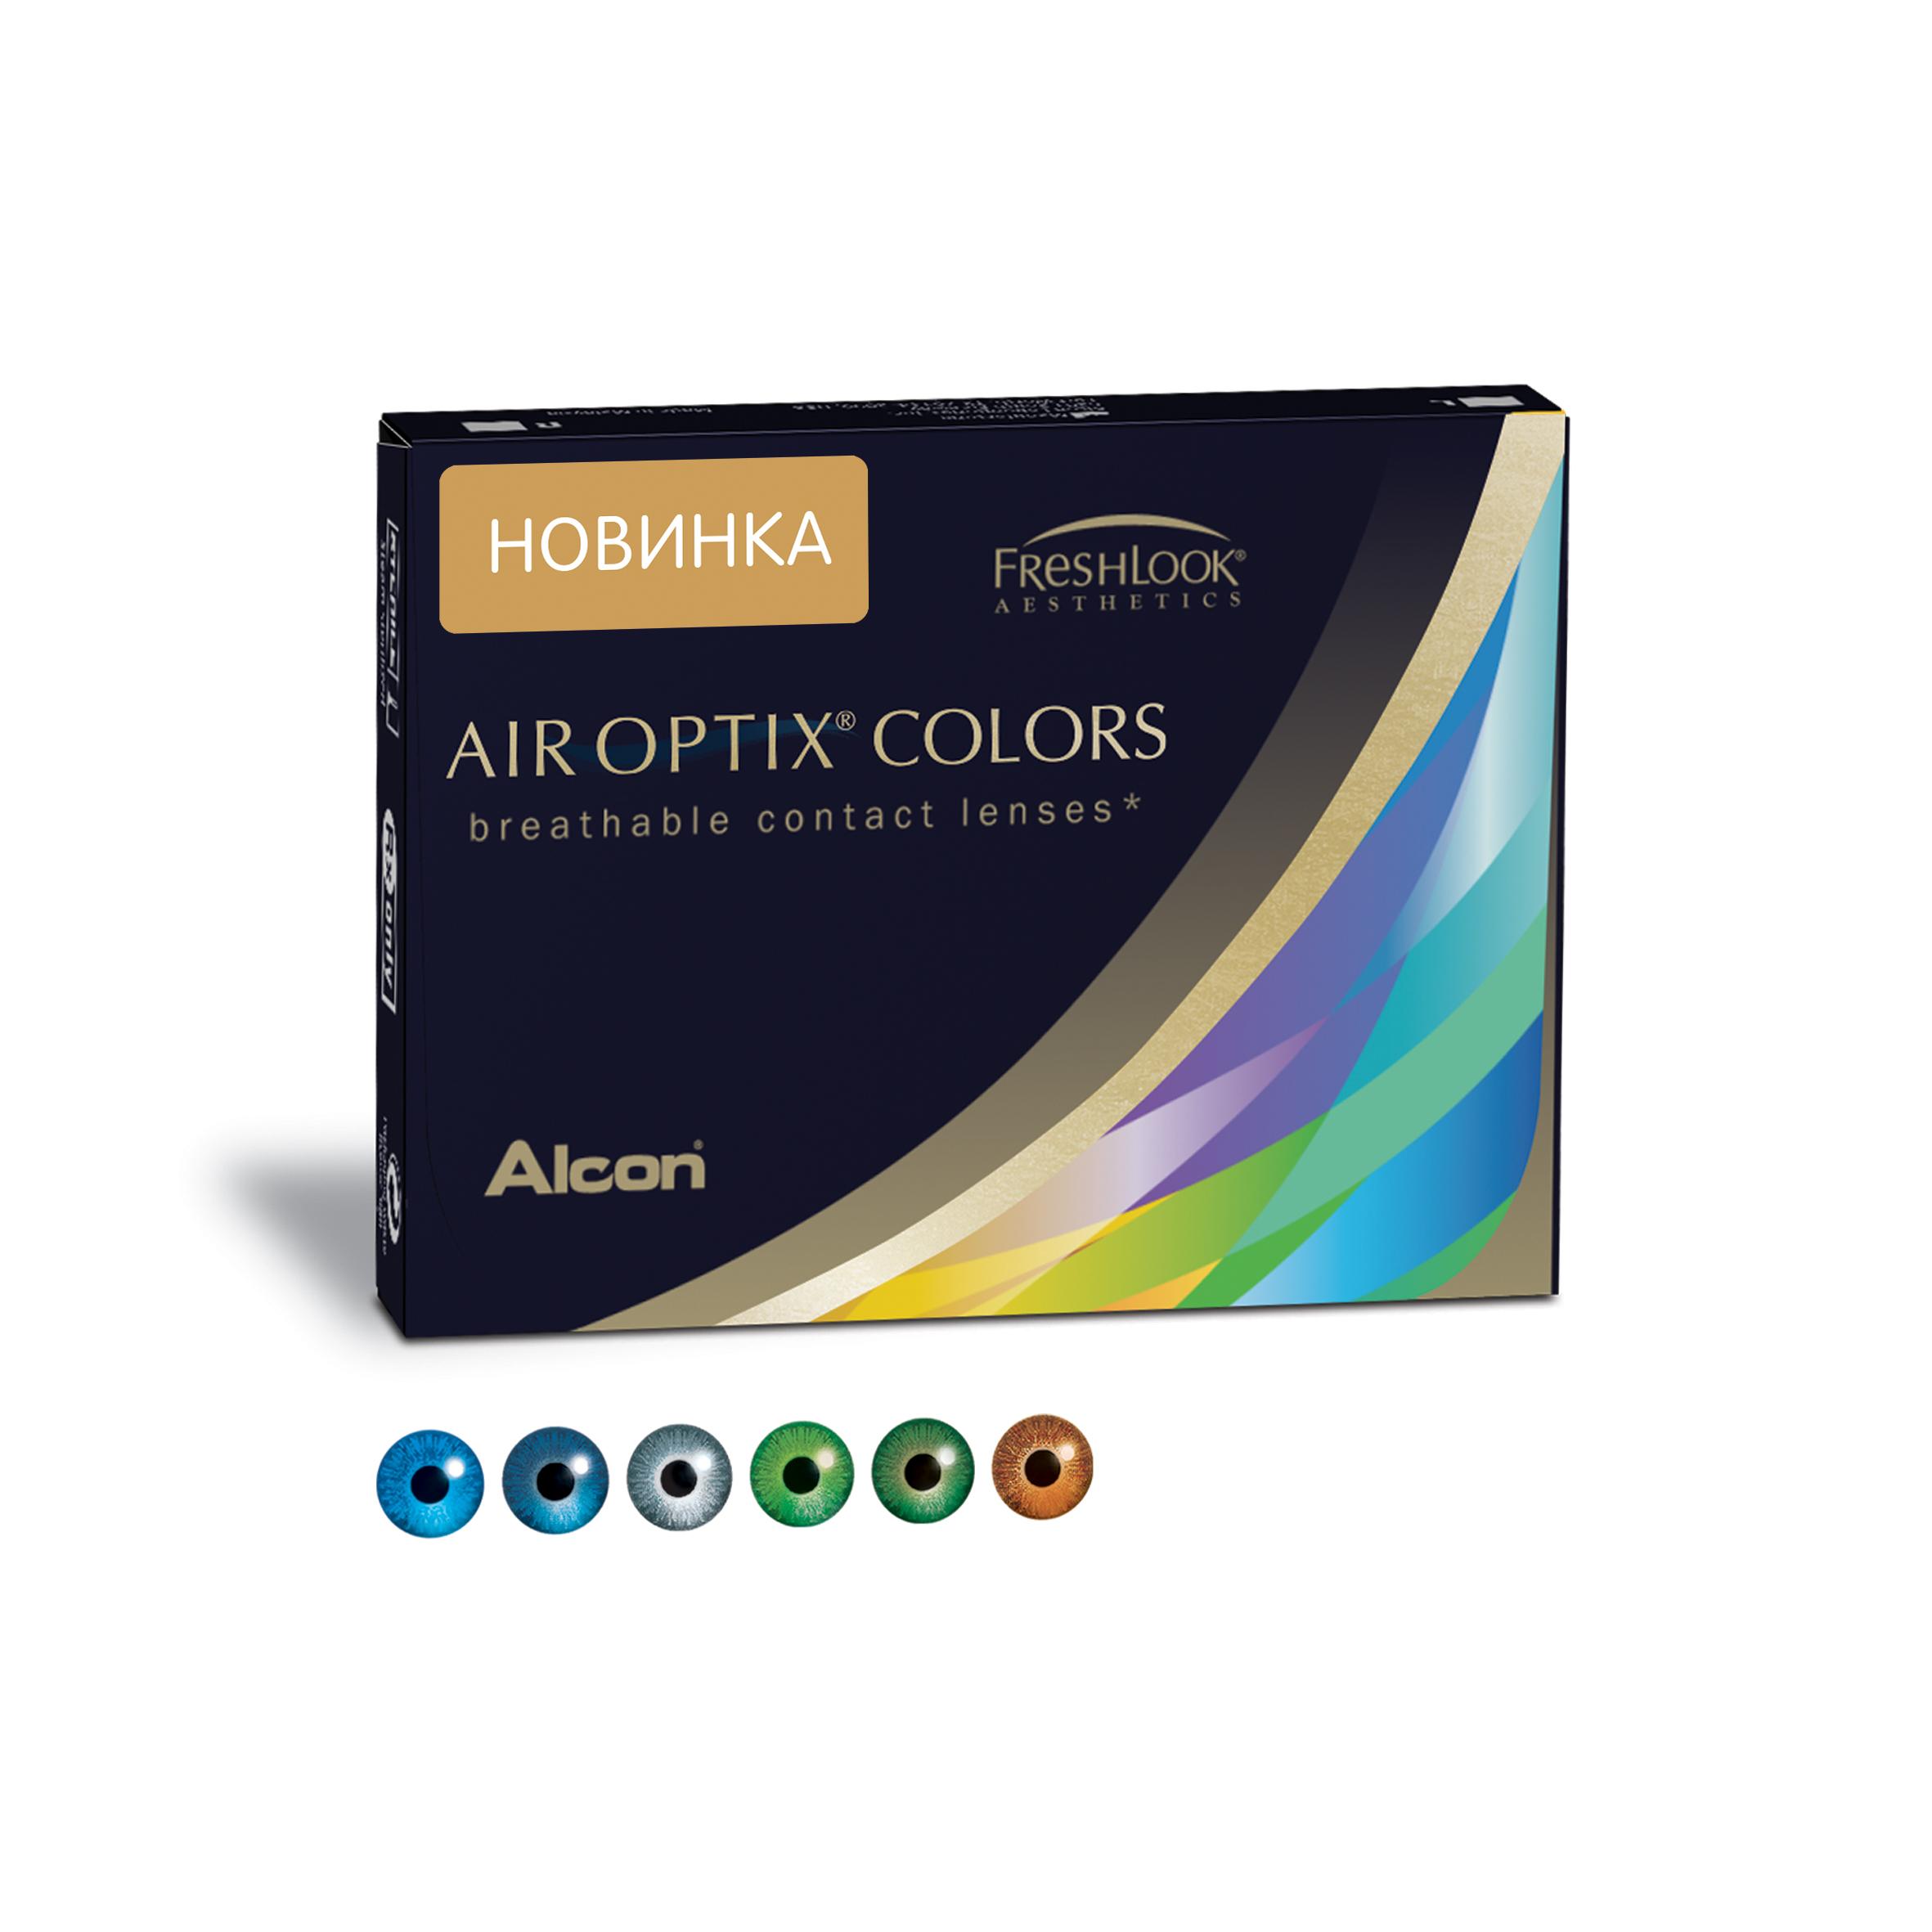 Аlcon контактные линзы Air Optix Colors 2 шт -5.50 Gemstone Green